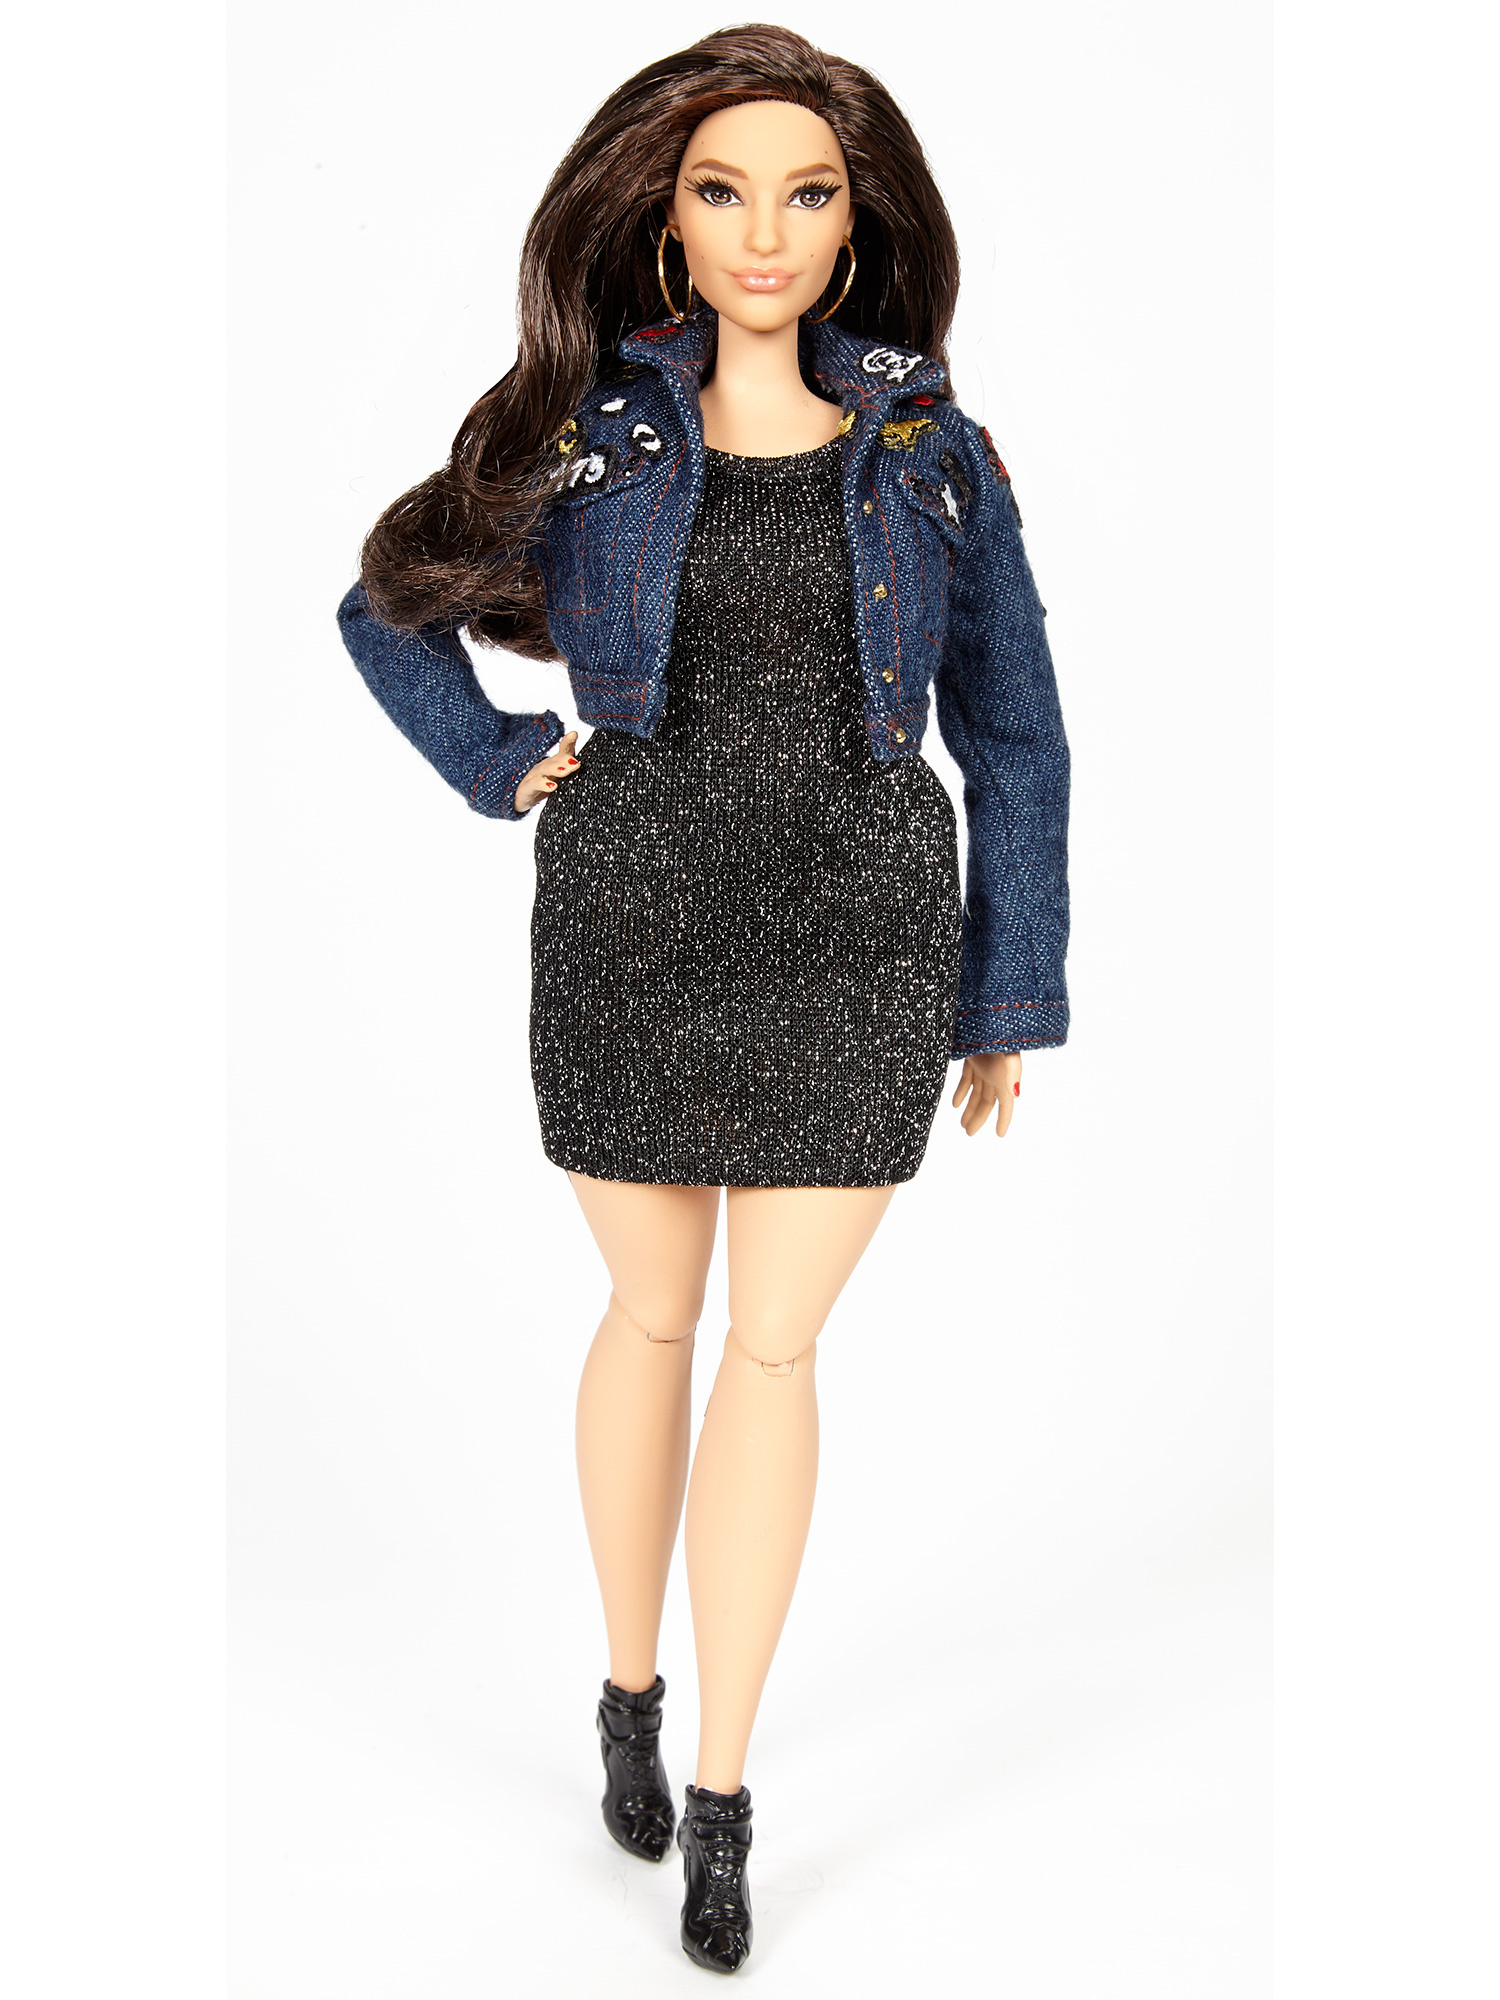 ashley graham barbie